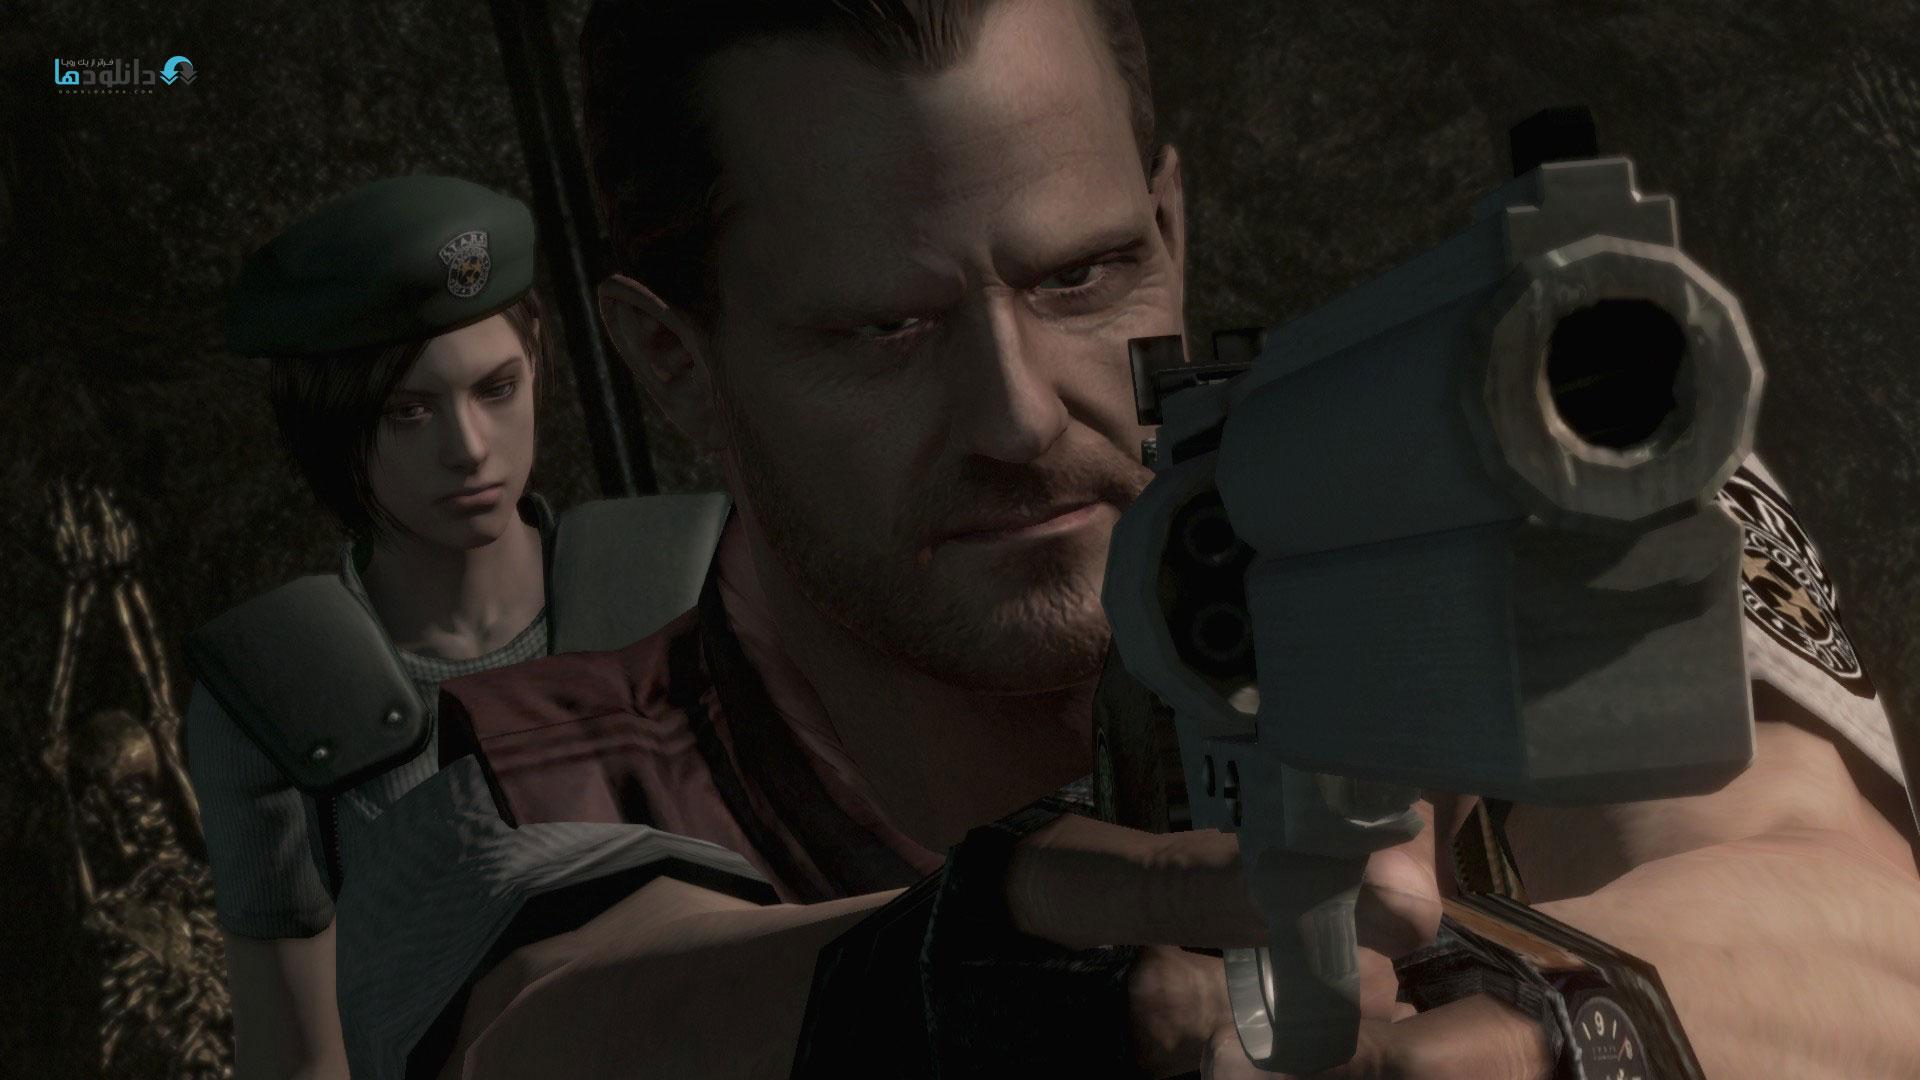 http://img5.downloadha.com/hosein/Game/January%202015/20/Resident-Evil-HD-Remaster-screenshots-06-large.jpg